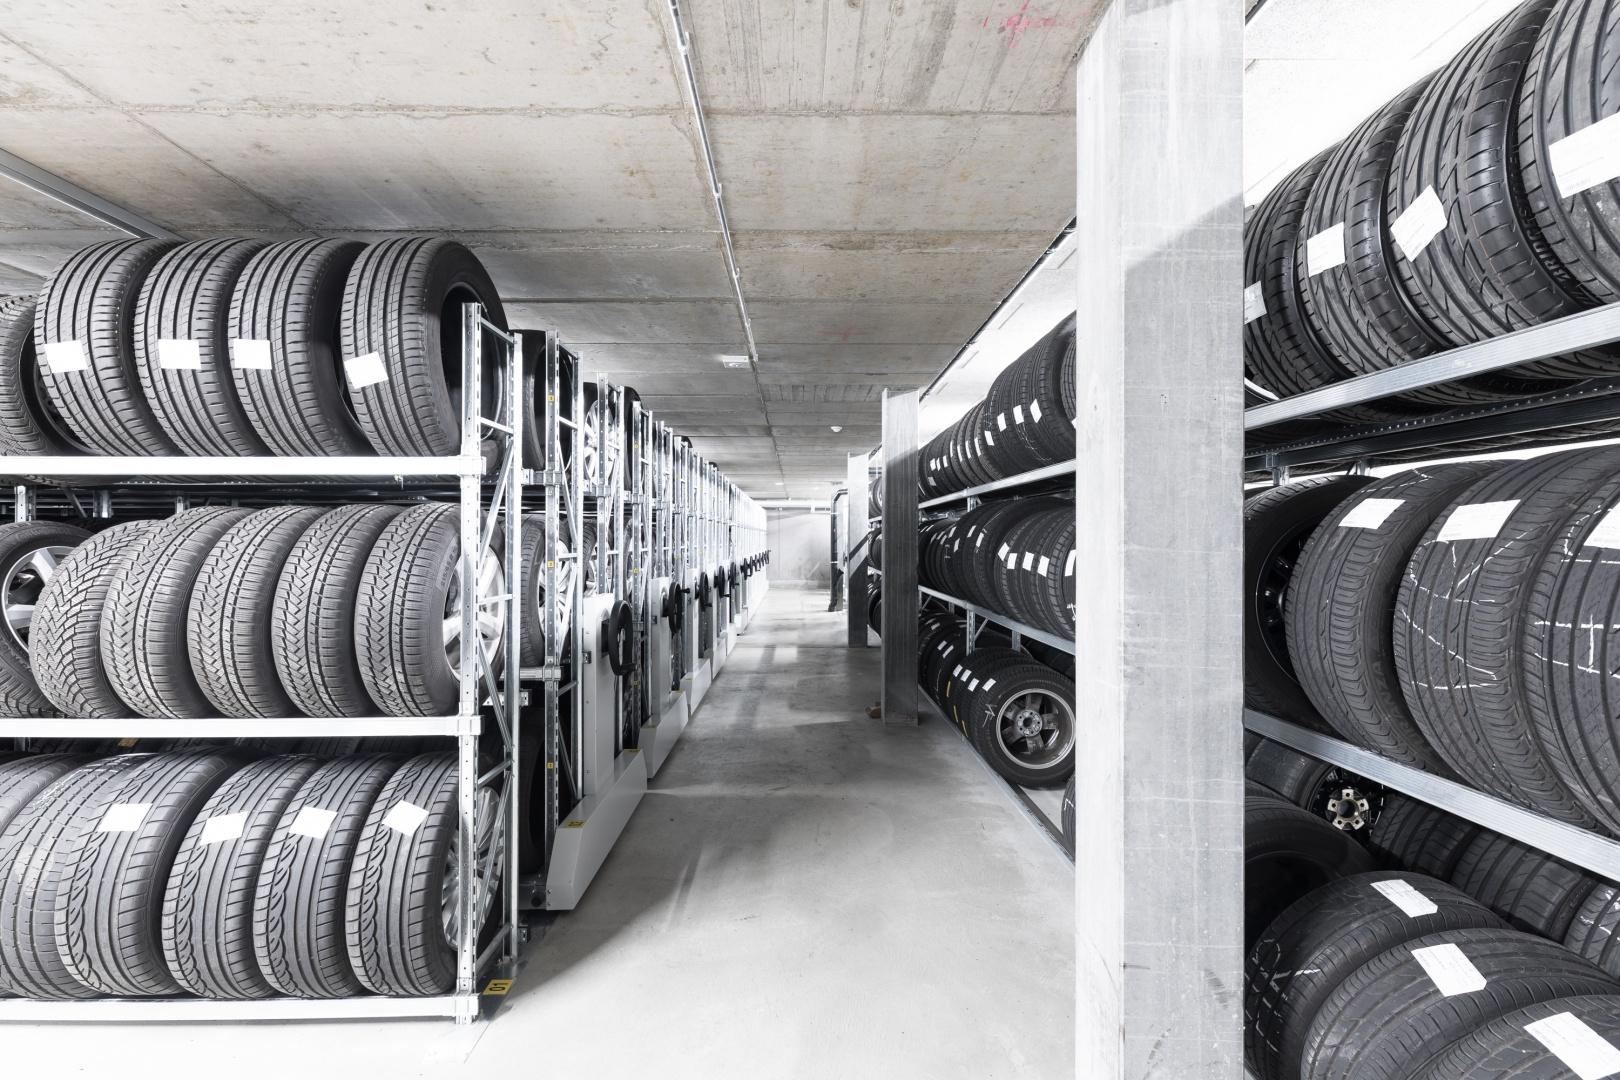 Reifenlager © KREN Architektur AG